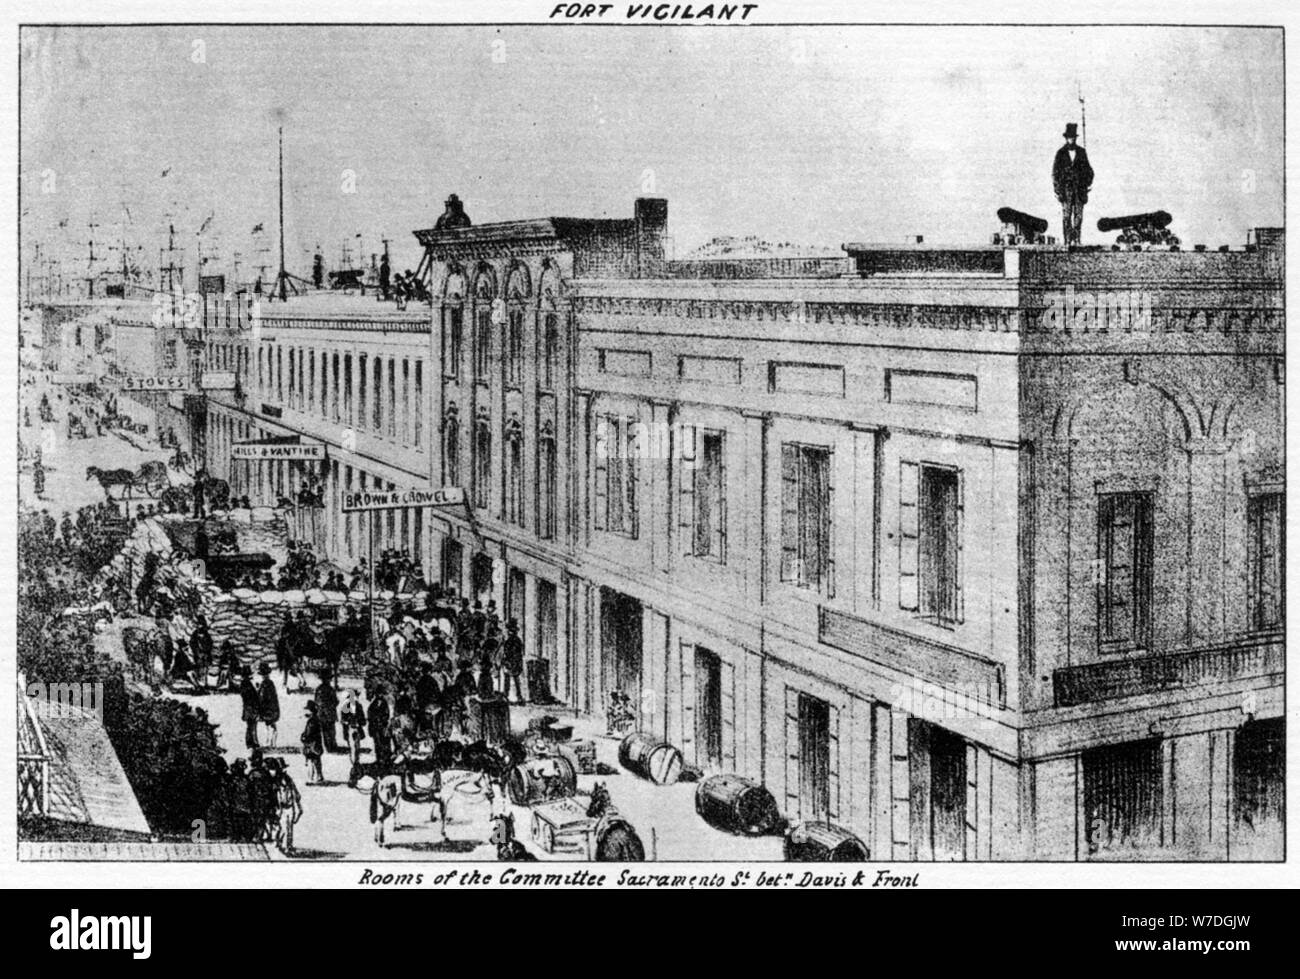 Fort Vigilant, Sacramento, California, 1856 (1937).Artist: Britton & Rey Stock Photo